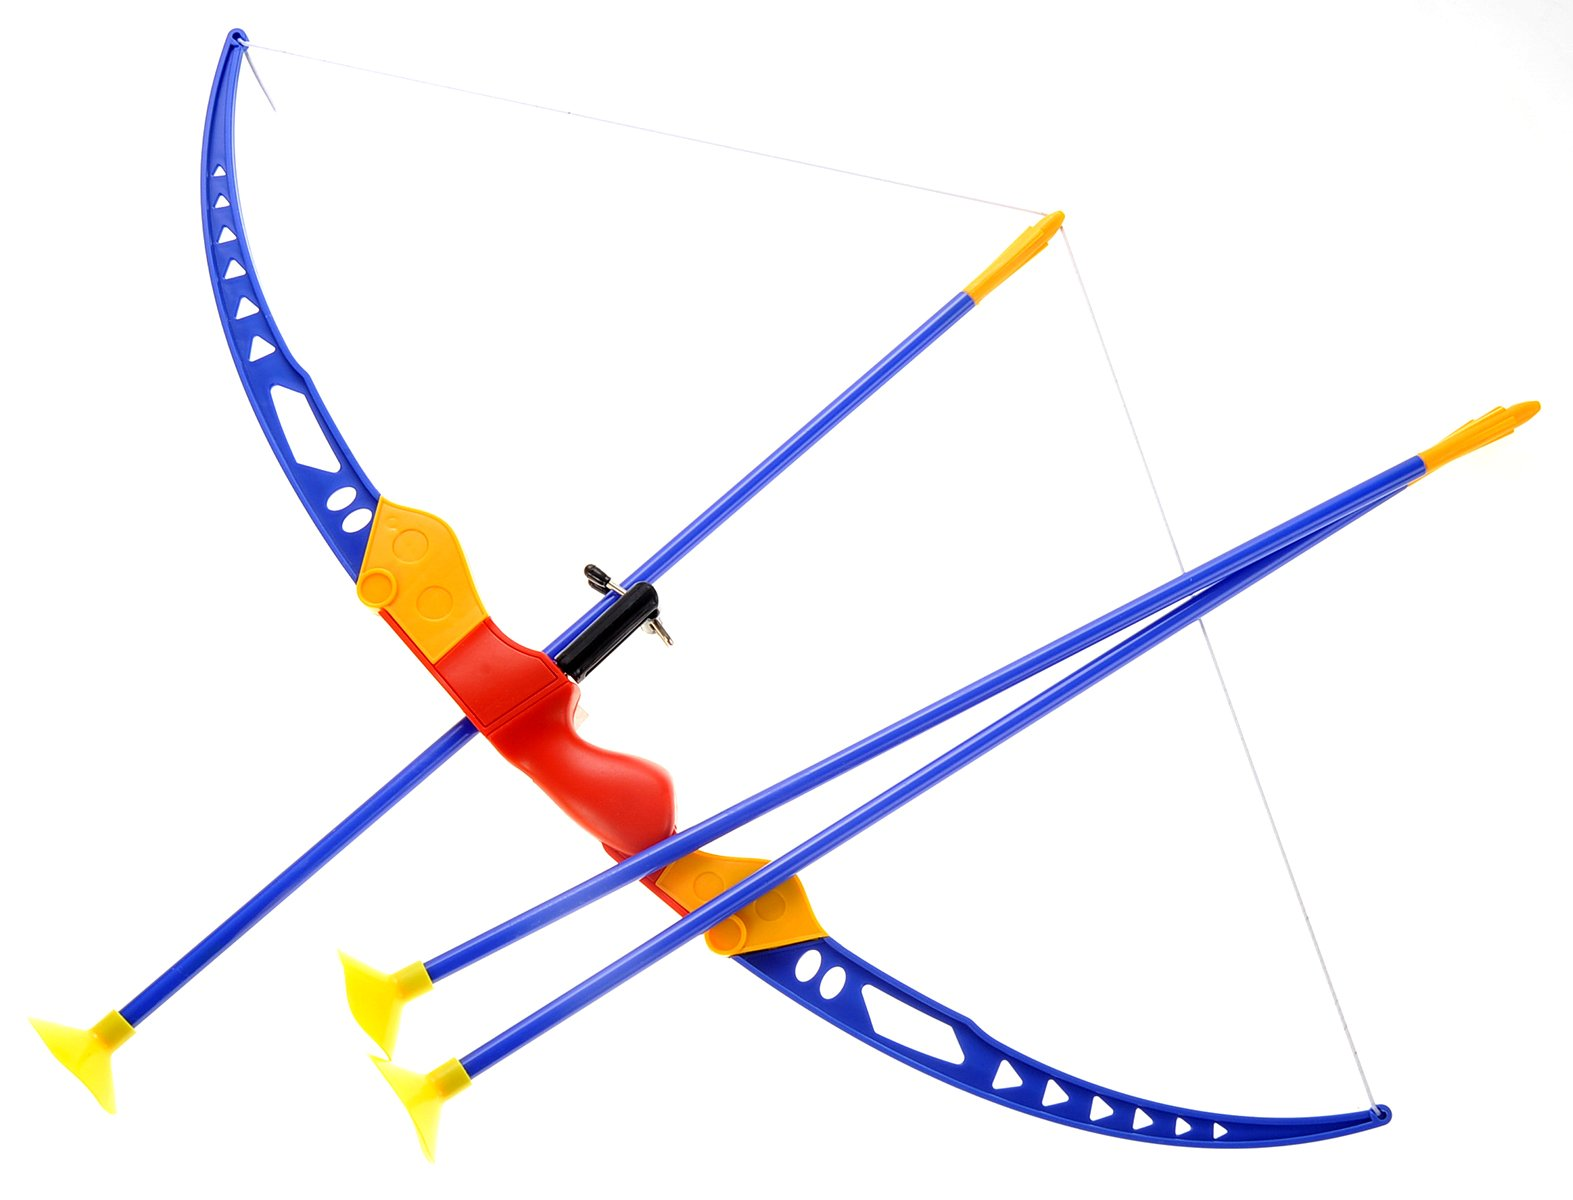 PowerTRC Sport Super Archery Children's Kid's Toy Bow And Arrow Dart Playset W/Suction Arrows